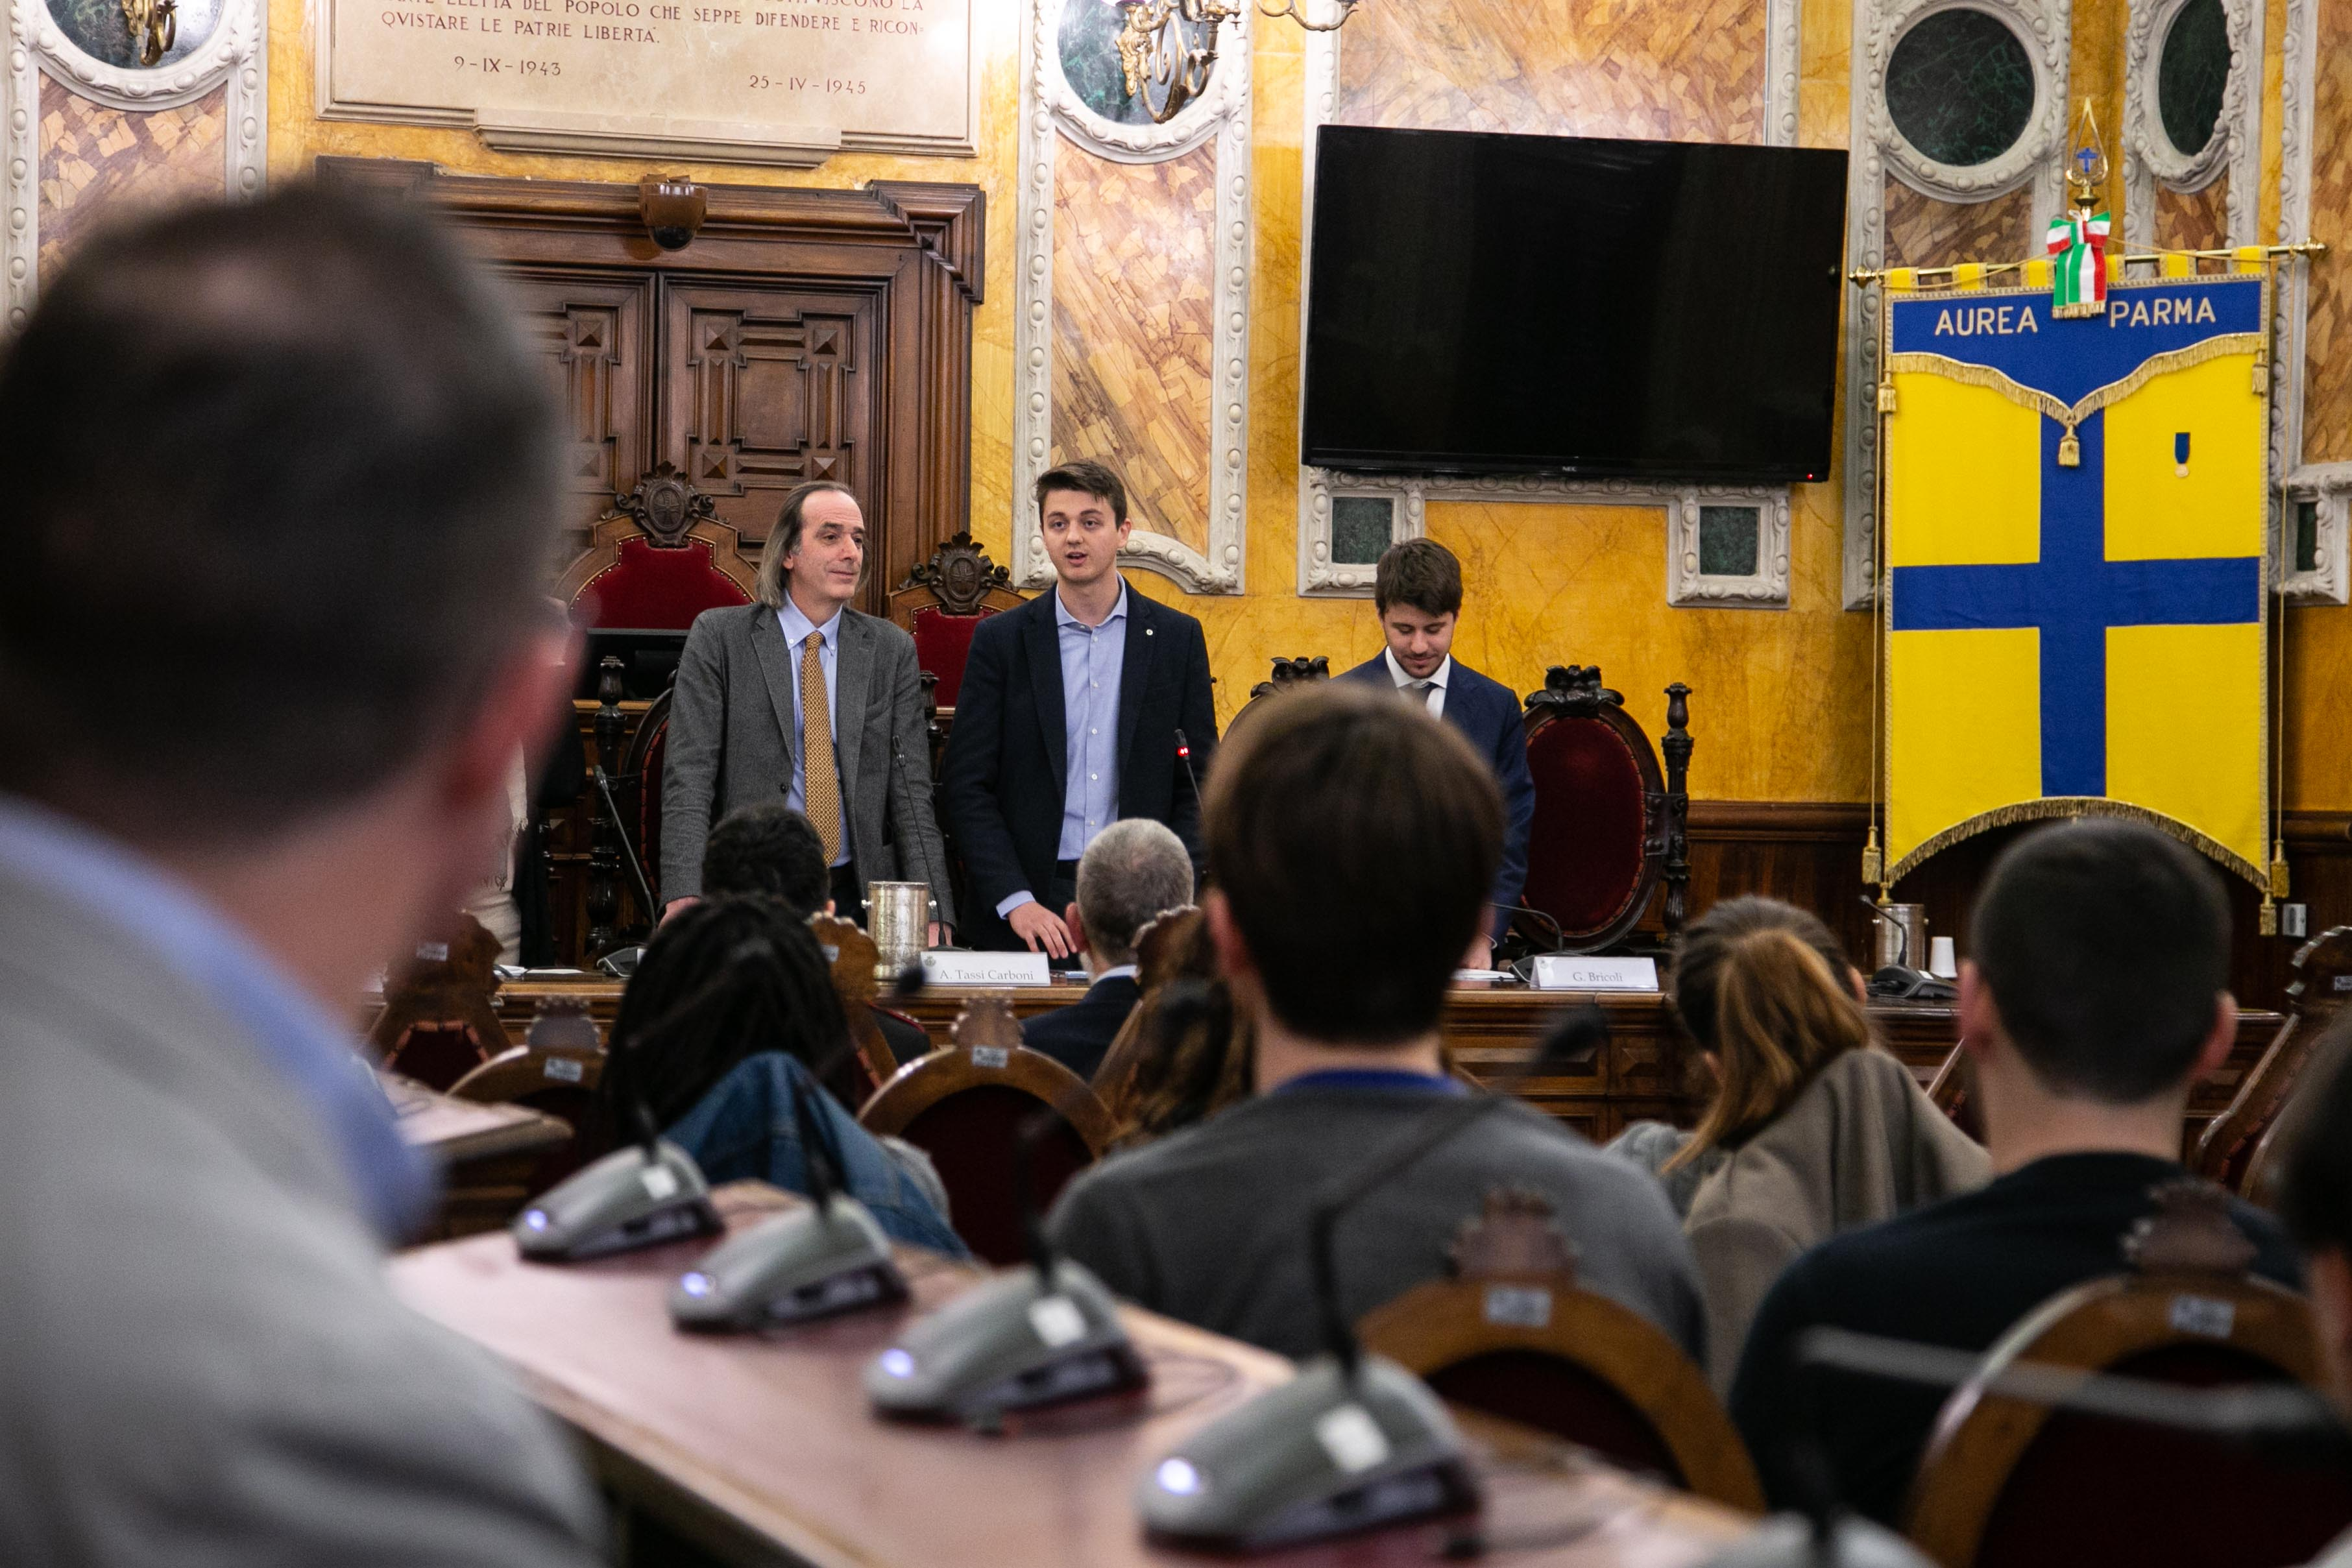 2019 03 13 Paci Tassi-Carboni Spadi consegna Costituzione-5